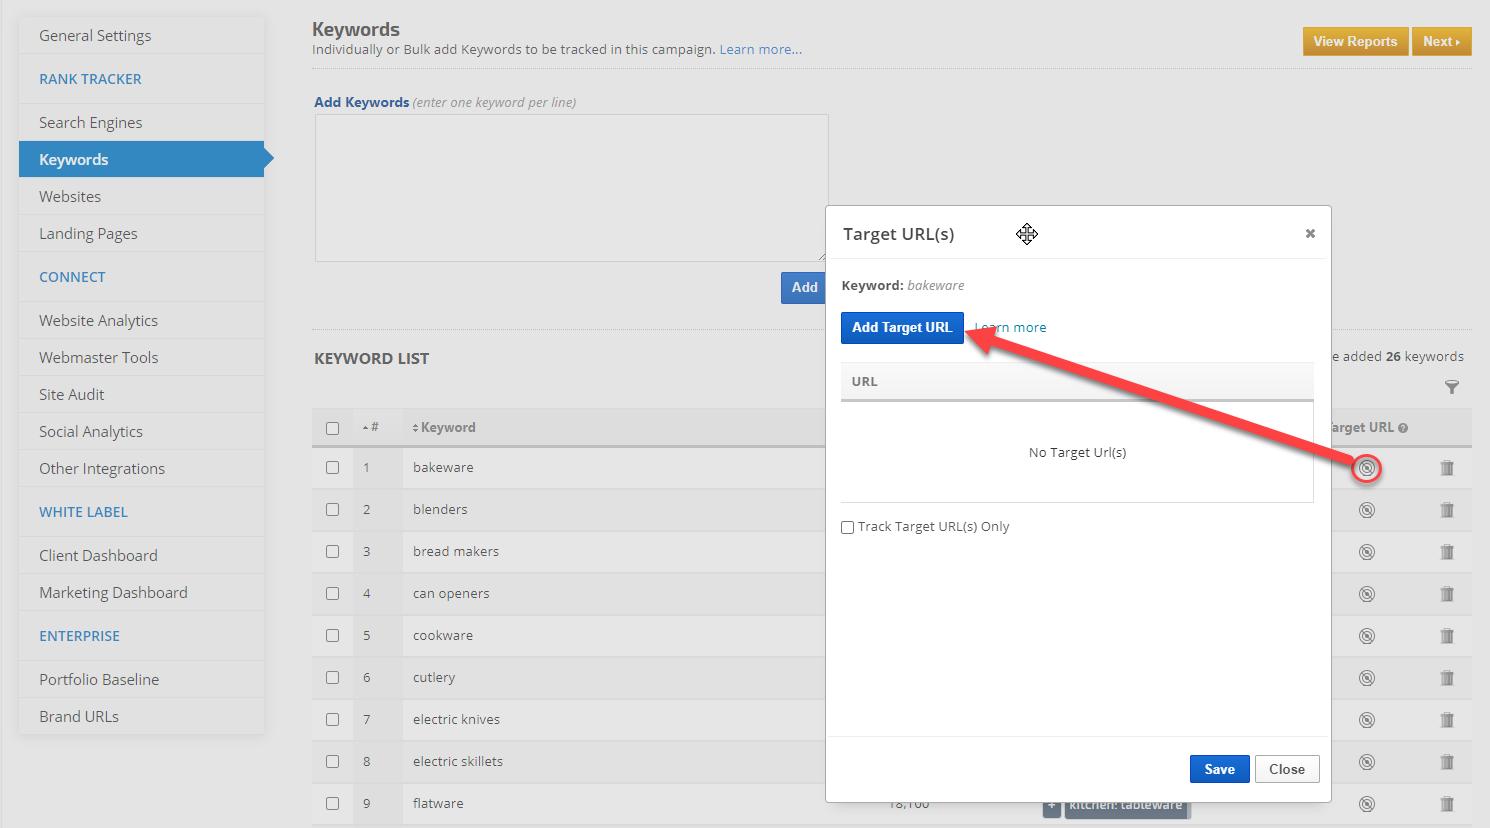 manually add Target URLs to keywords